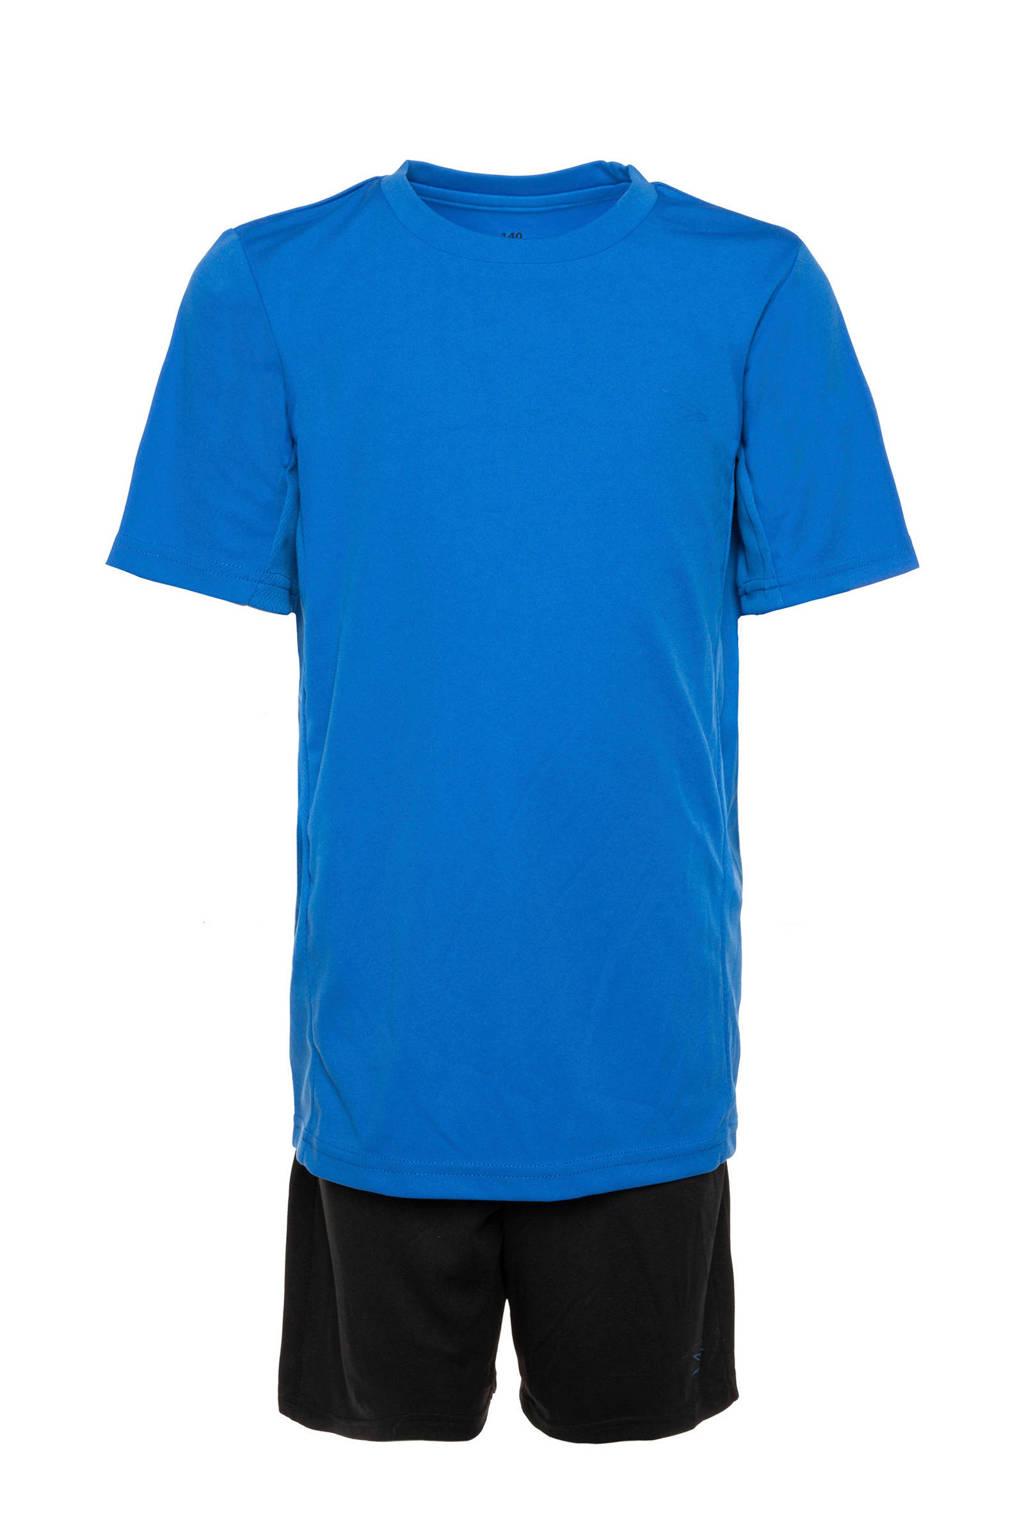 Scapino Dutchy   sportset 2-delig, Blauw/zwart